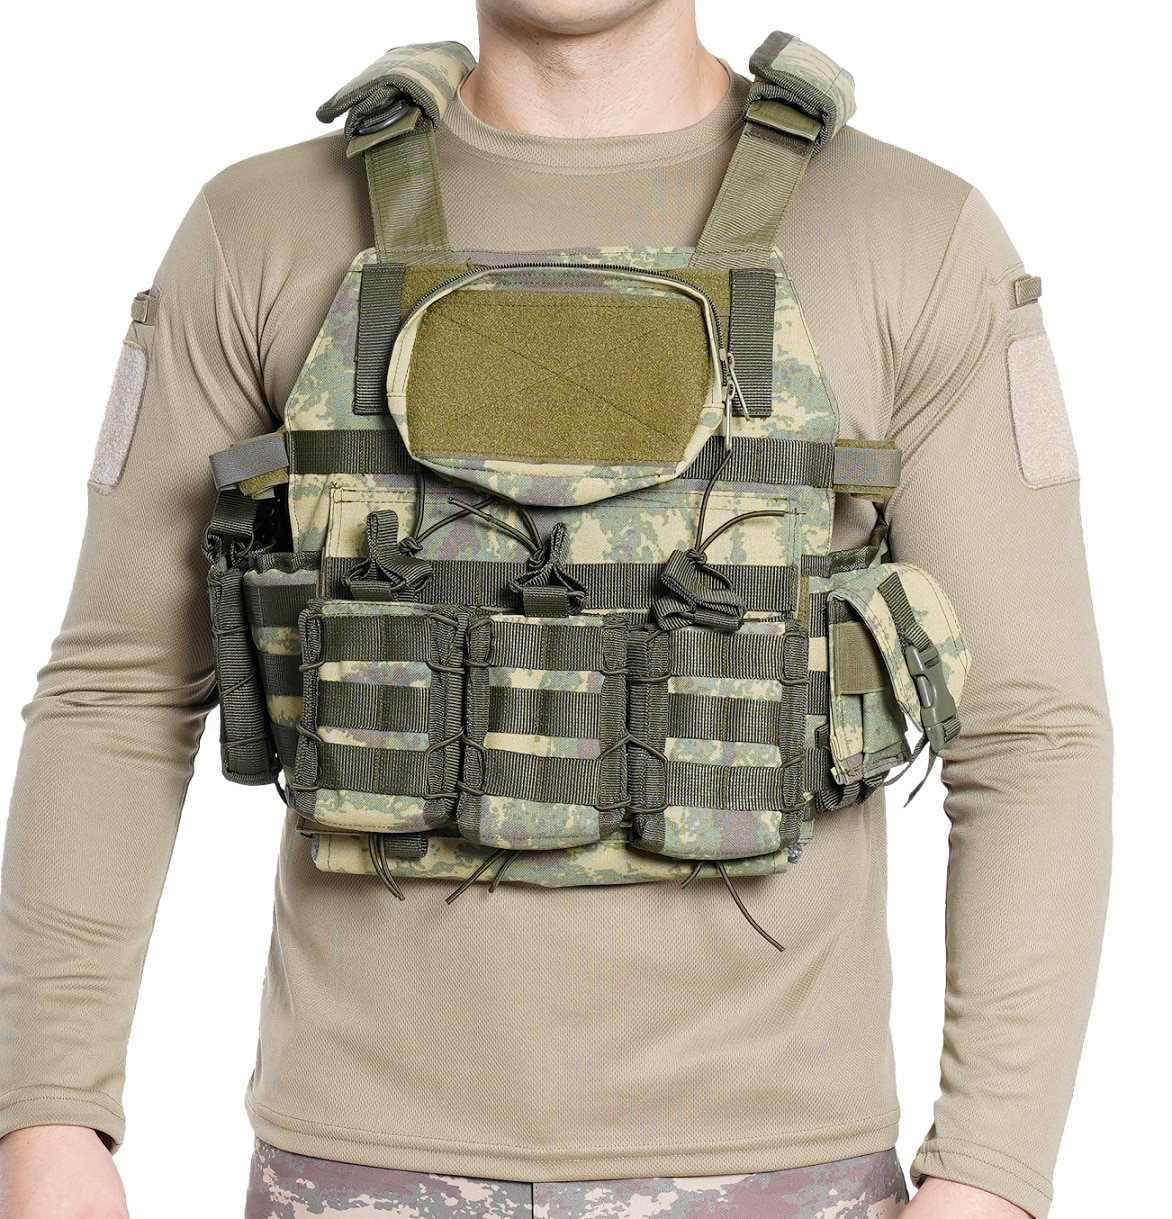 Tactical Vest Outdoor Vest, Army Fans Outdoor Vest Cs Game Vest,expand Training Field Equipment